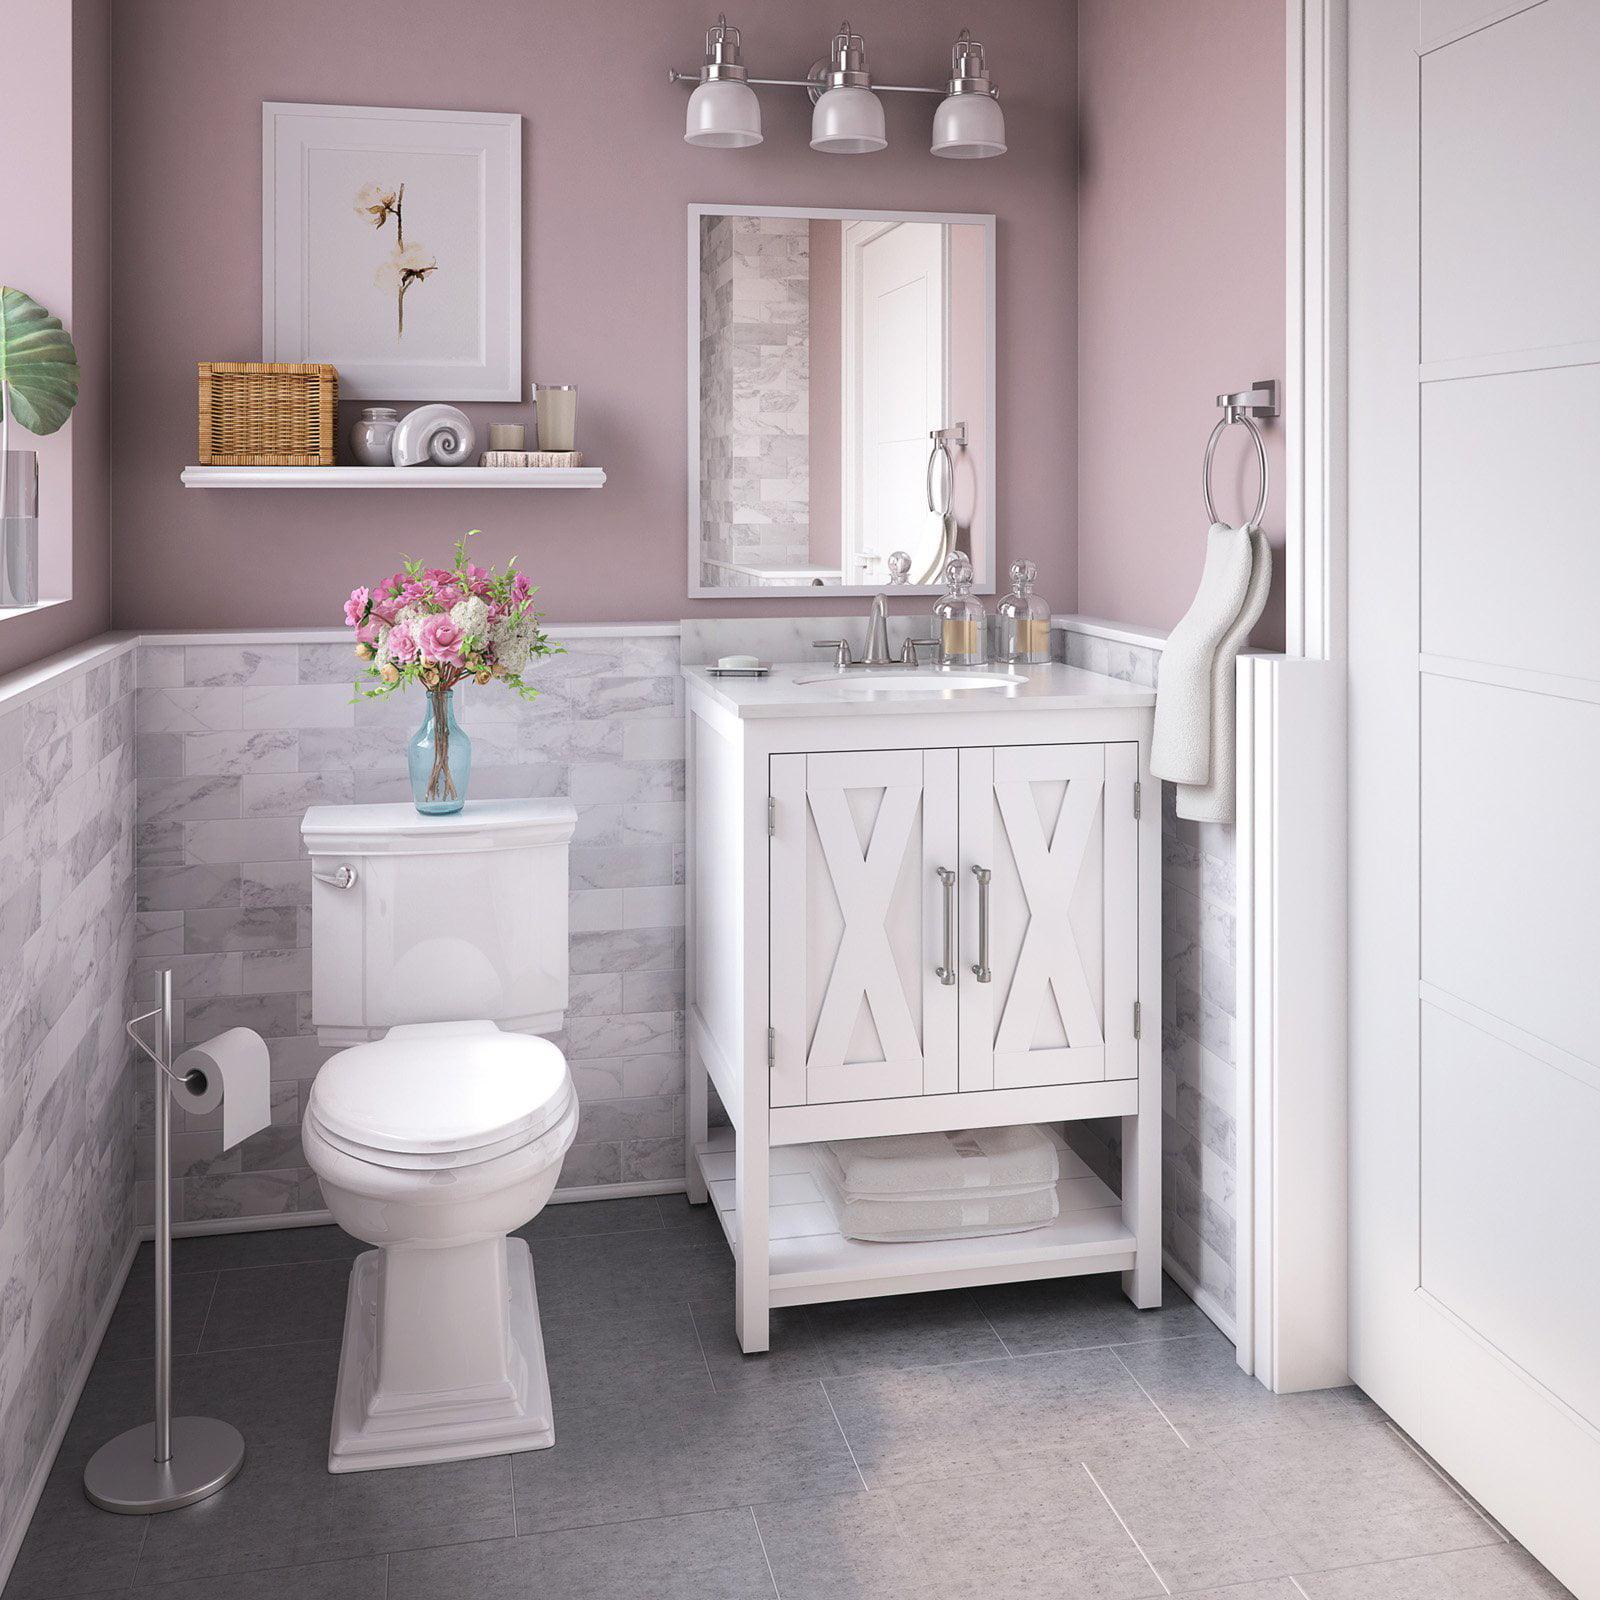 BellO Conington 24 in. Freestanding Single Sink Bathroom Vanity Base